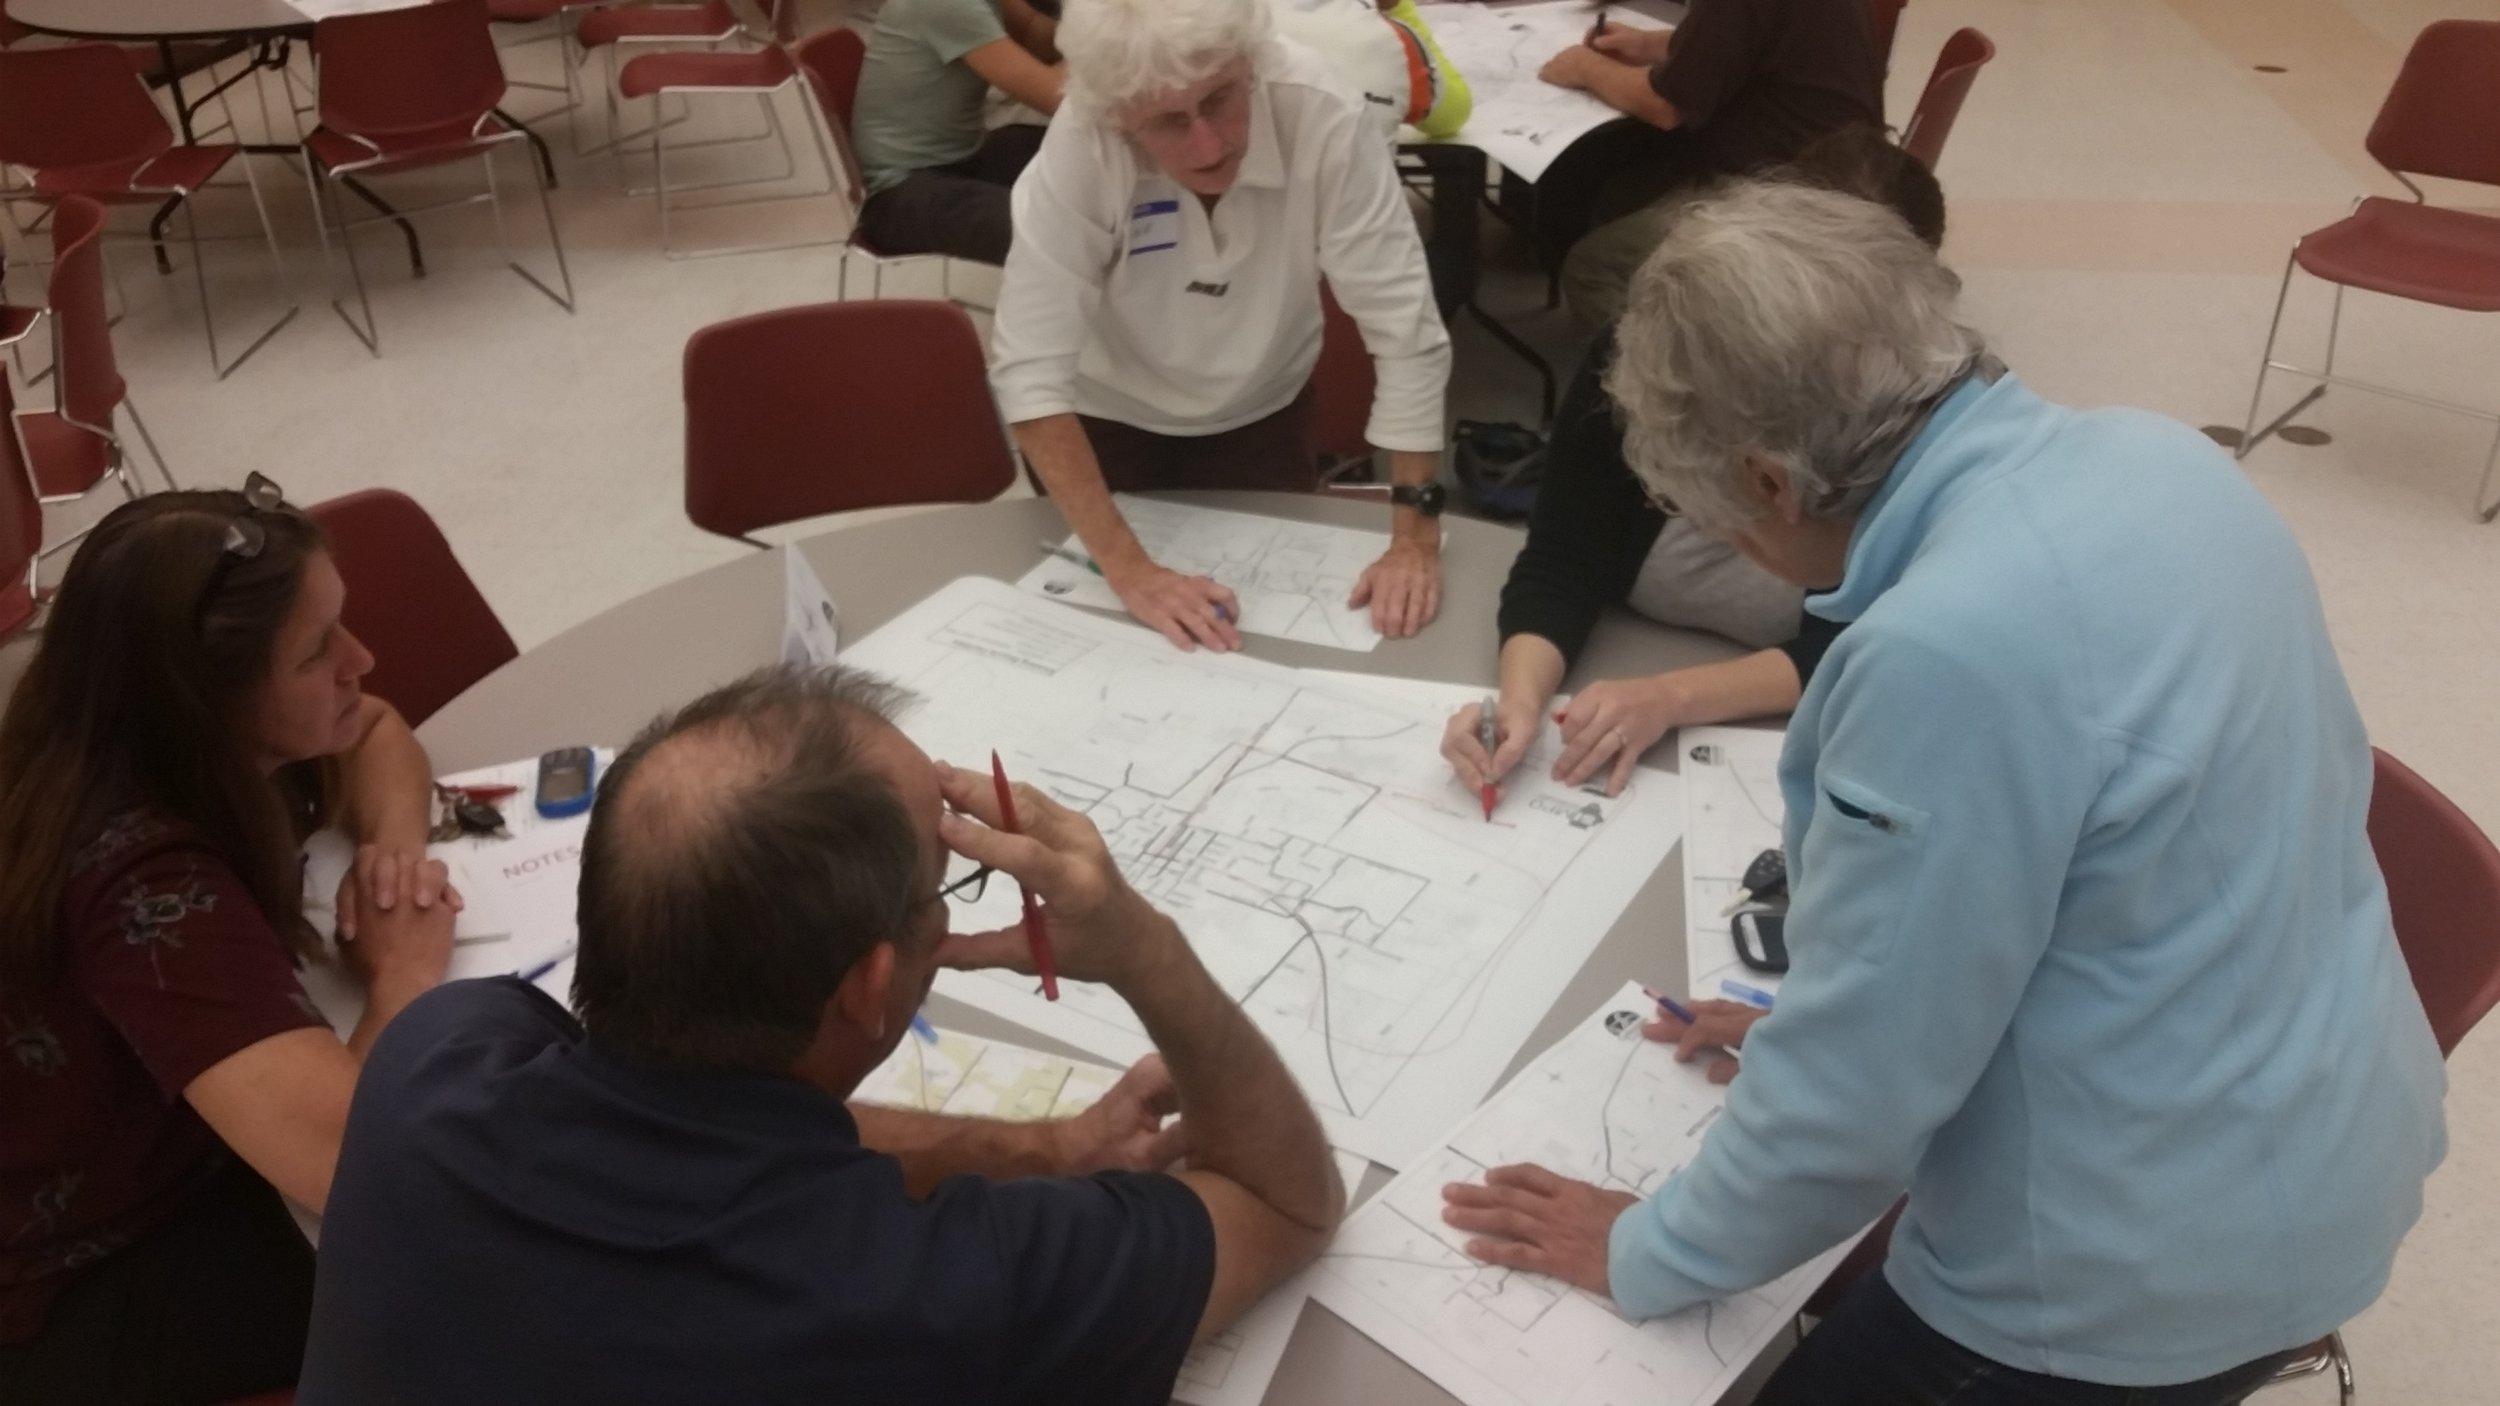 i    interdisciplinary planning and design process